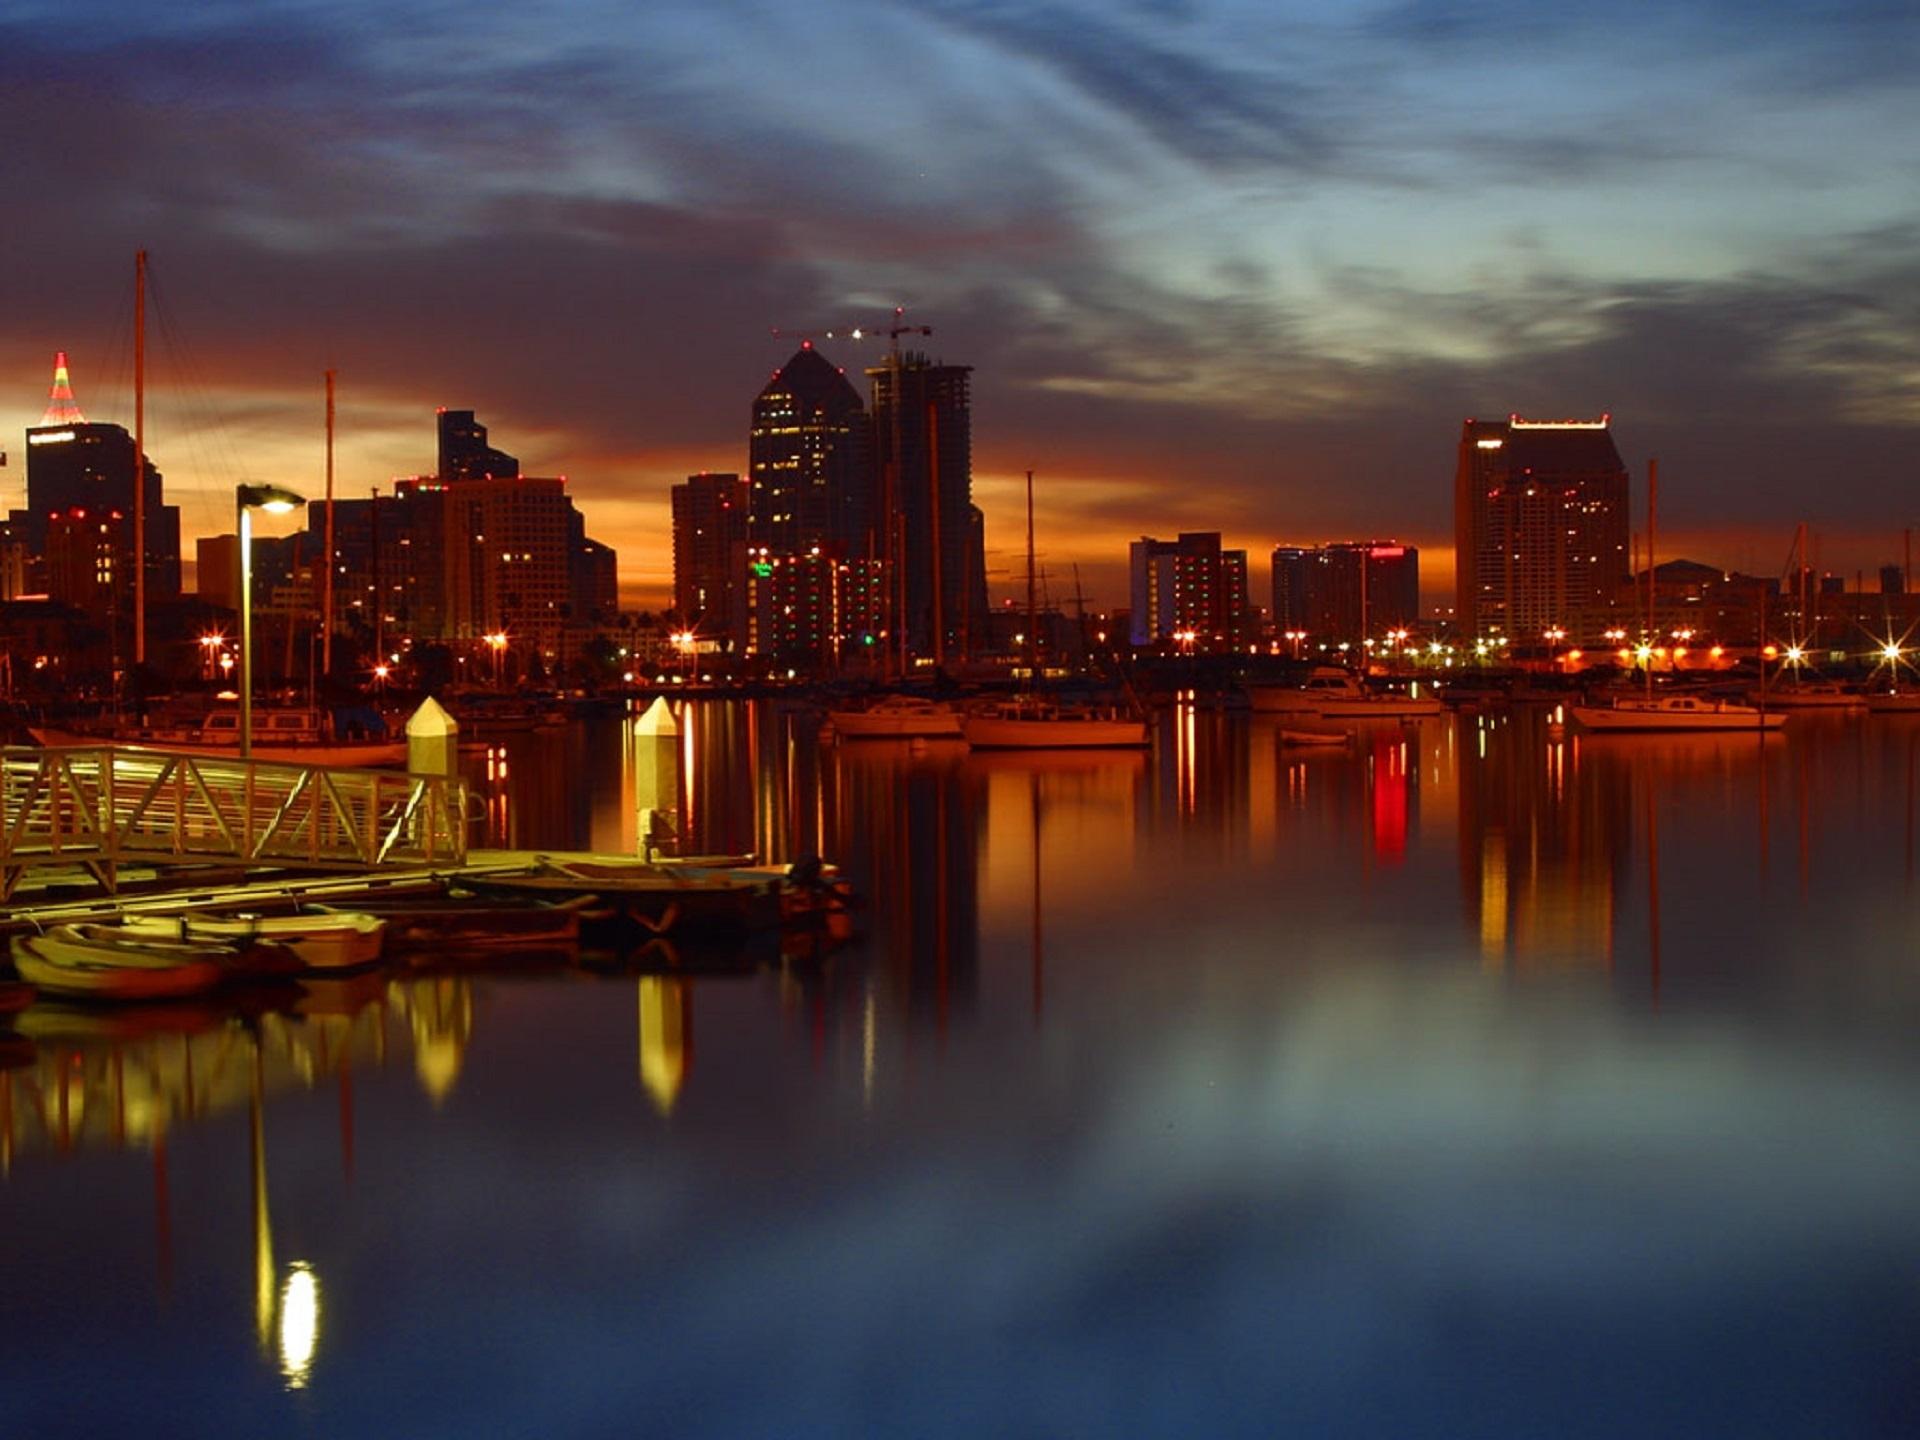 San Diego Bay, Architecture, Bay, Boat, City, HQ Photo